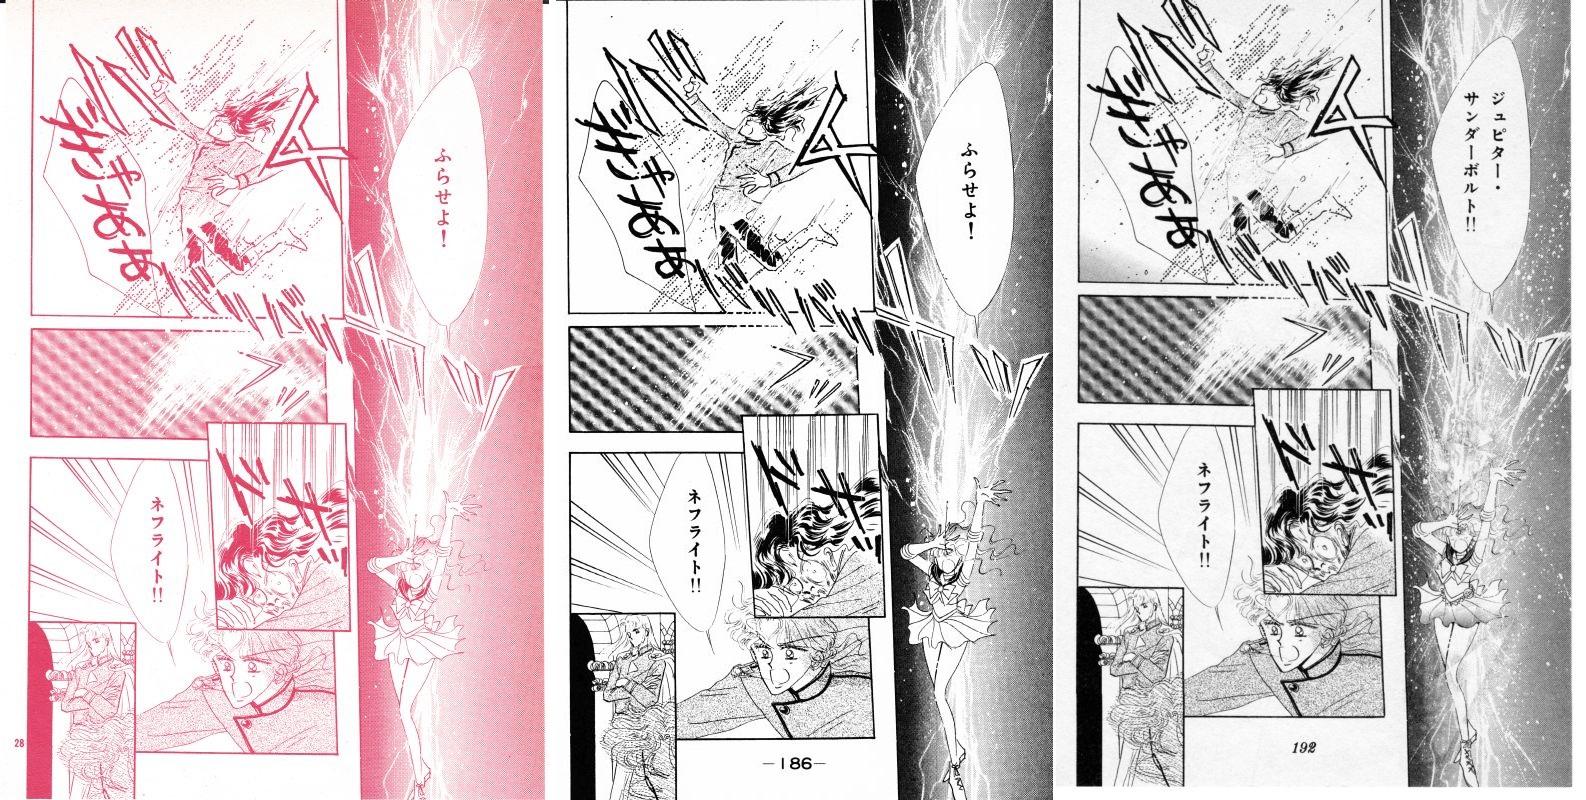 Act 5, Page 26 – Nakayoshi, Original, Remaster